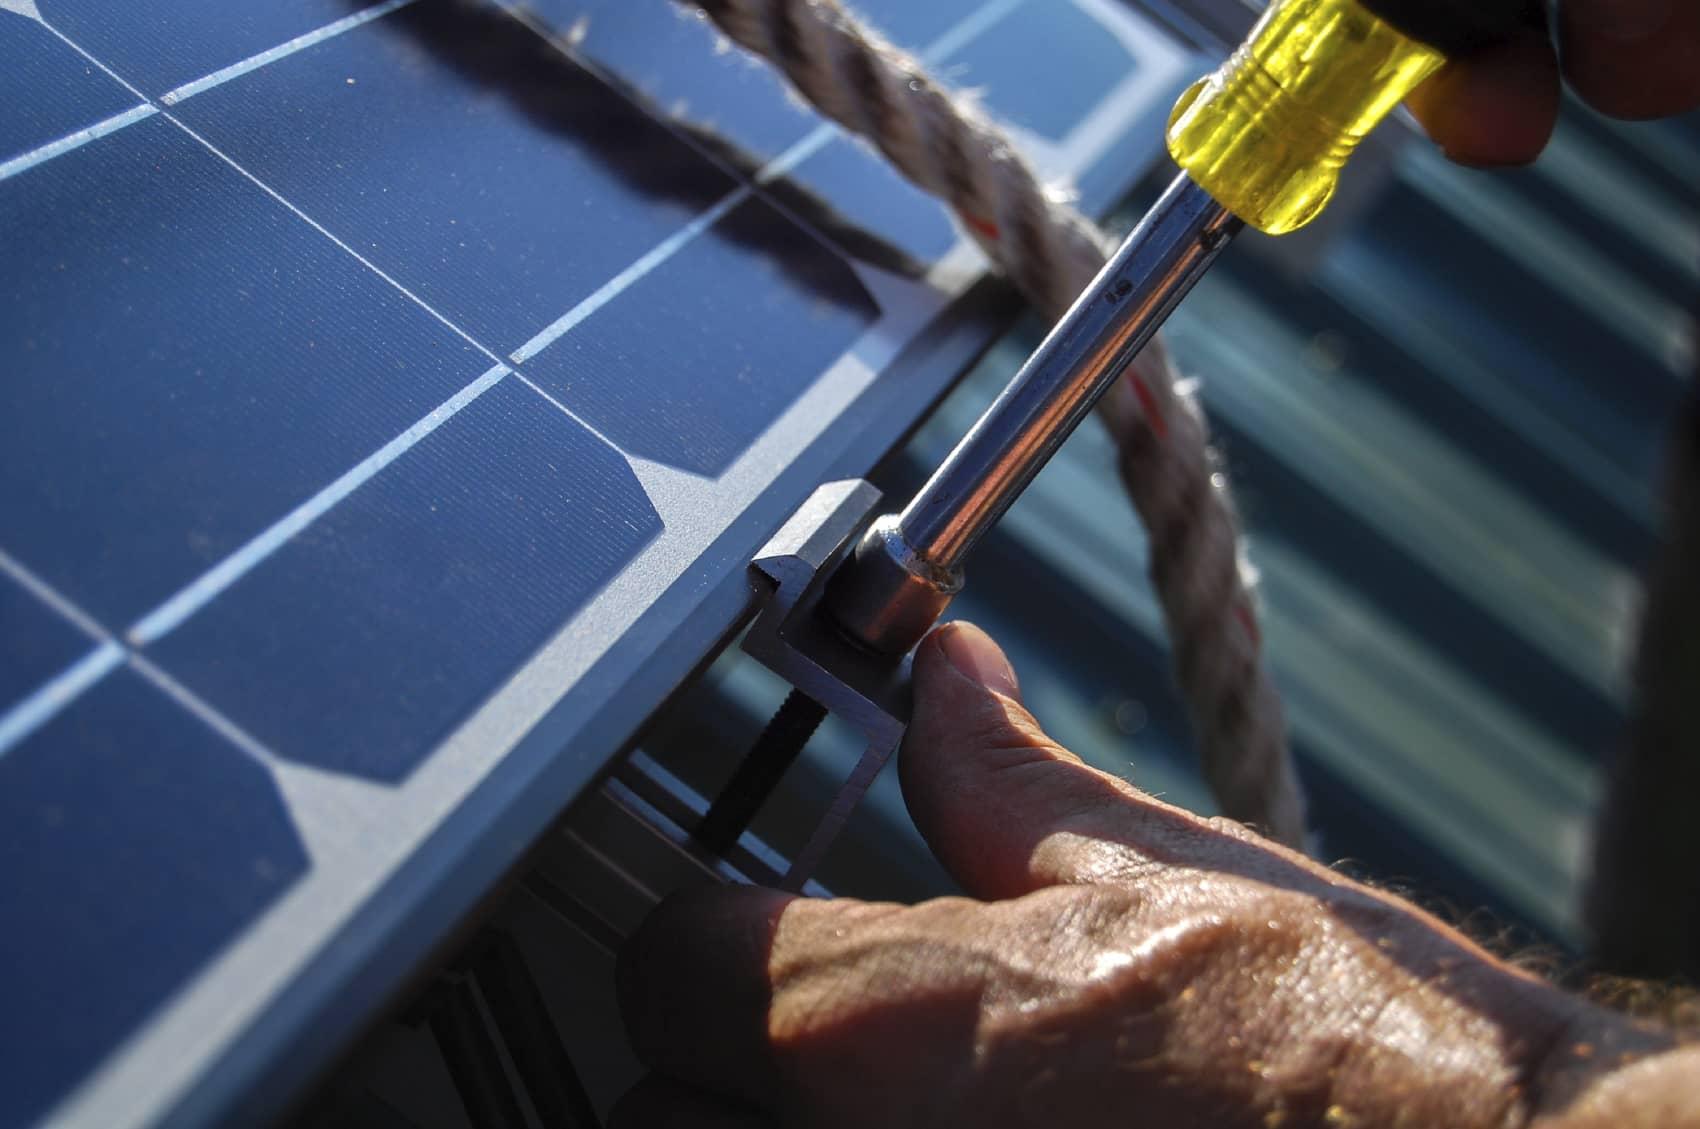 iStock_000030650940_Medium SolarCity, Balfour Beatty Communities Bring Solar To Navy Bases